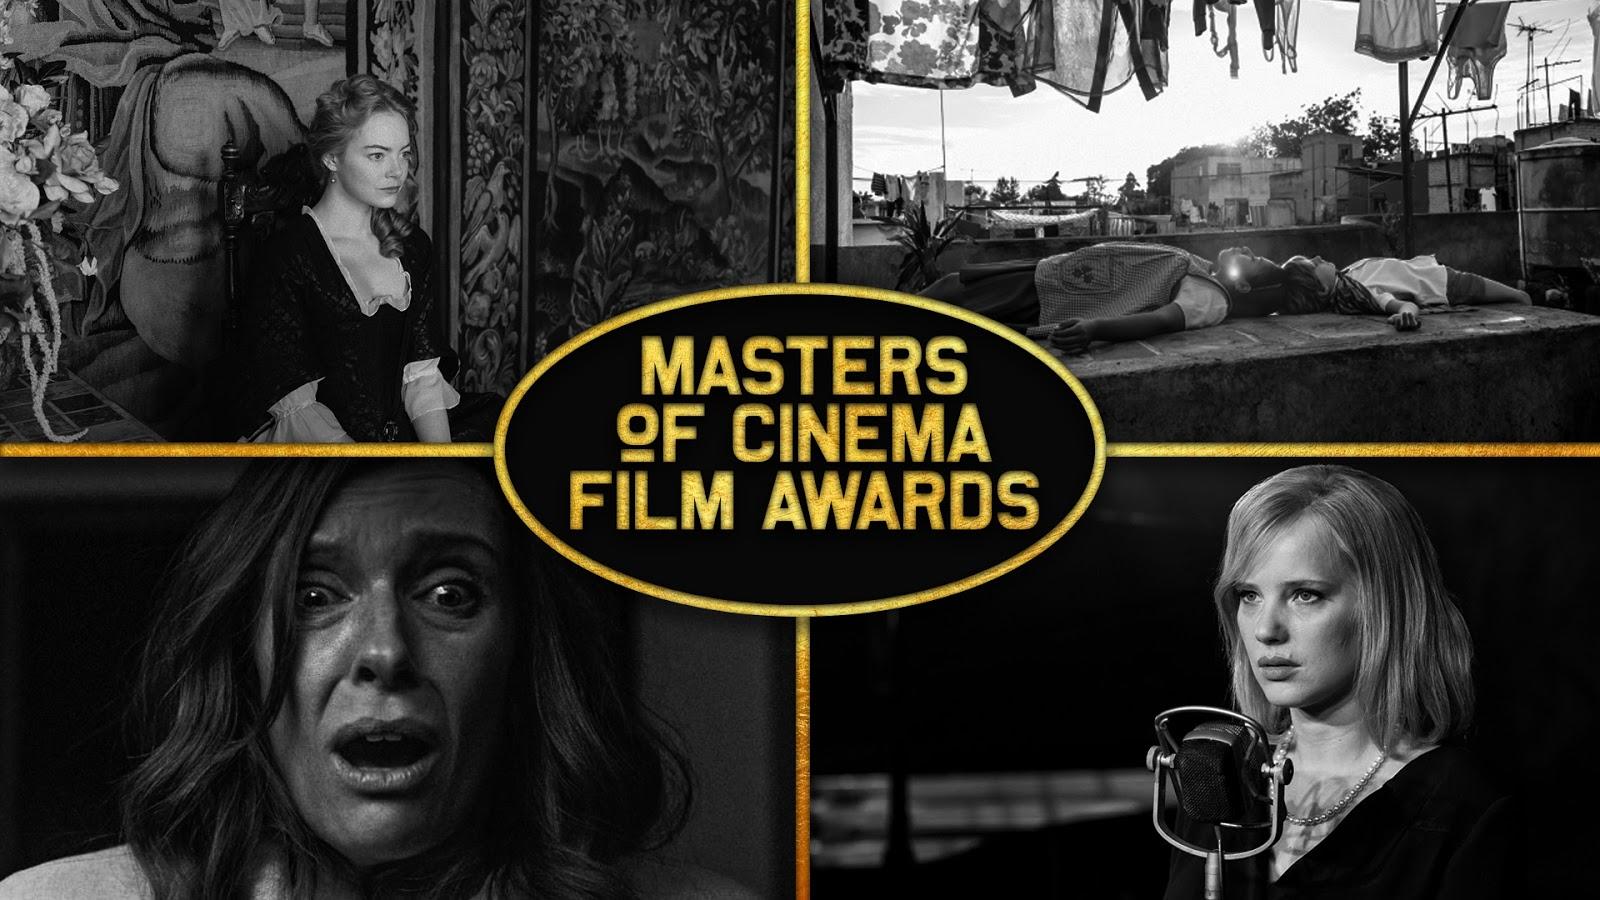 Masters Of Cinema Film Awards 2019 Nominees